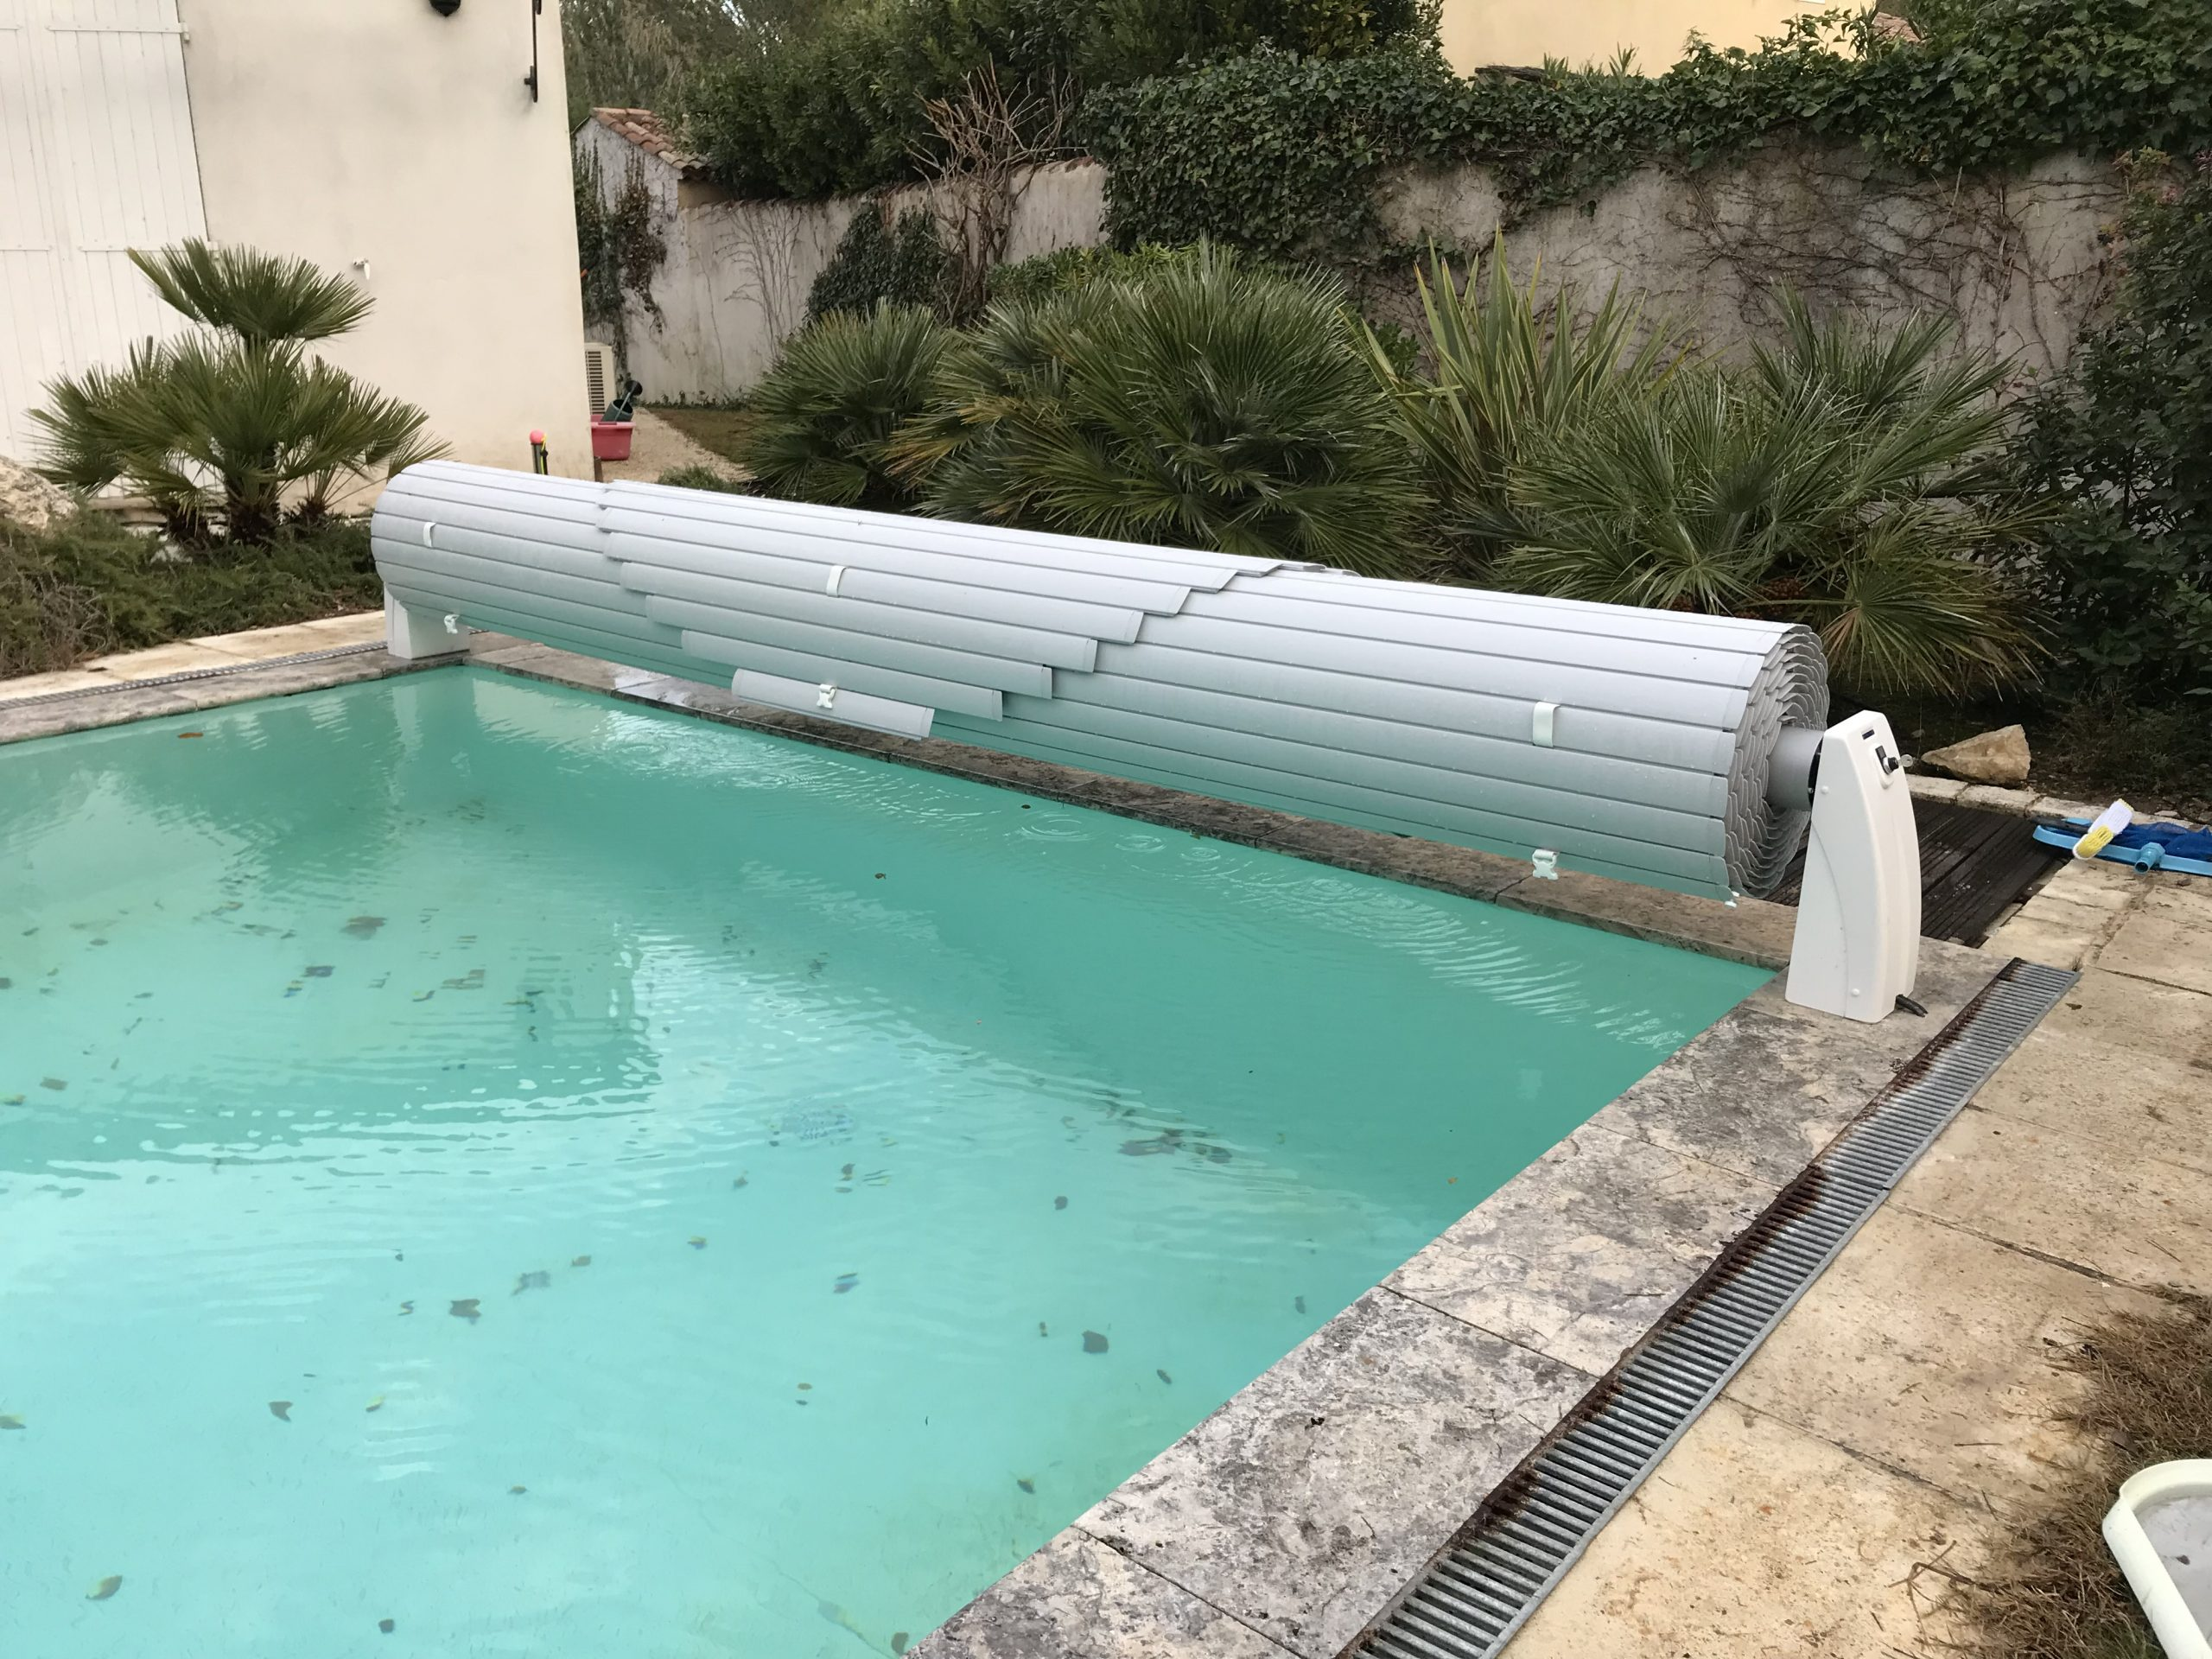 Sun Pool Piscine - Volet Roulant encequiconcerne Volet Roulant Piscine Hors Sol